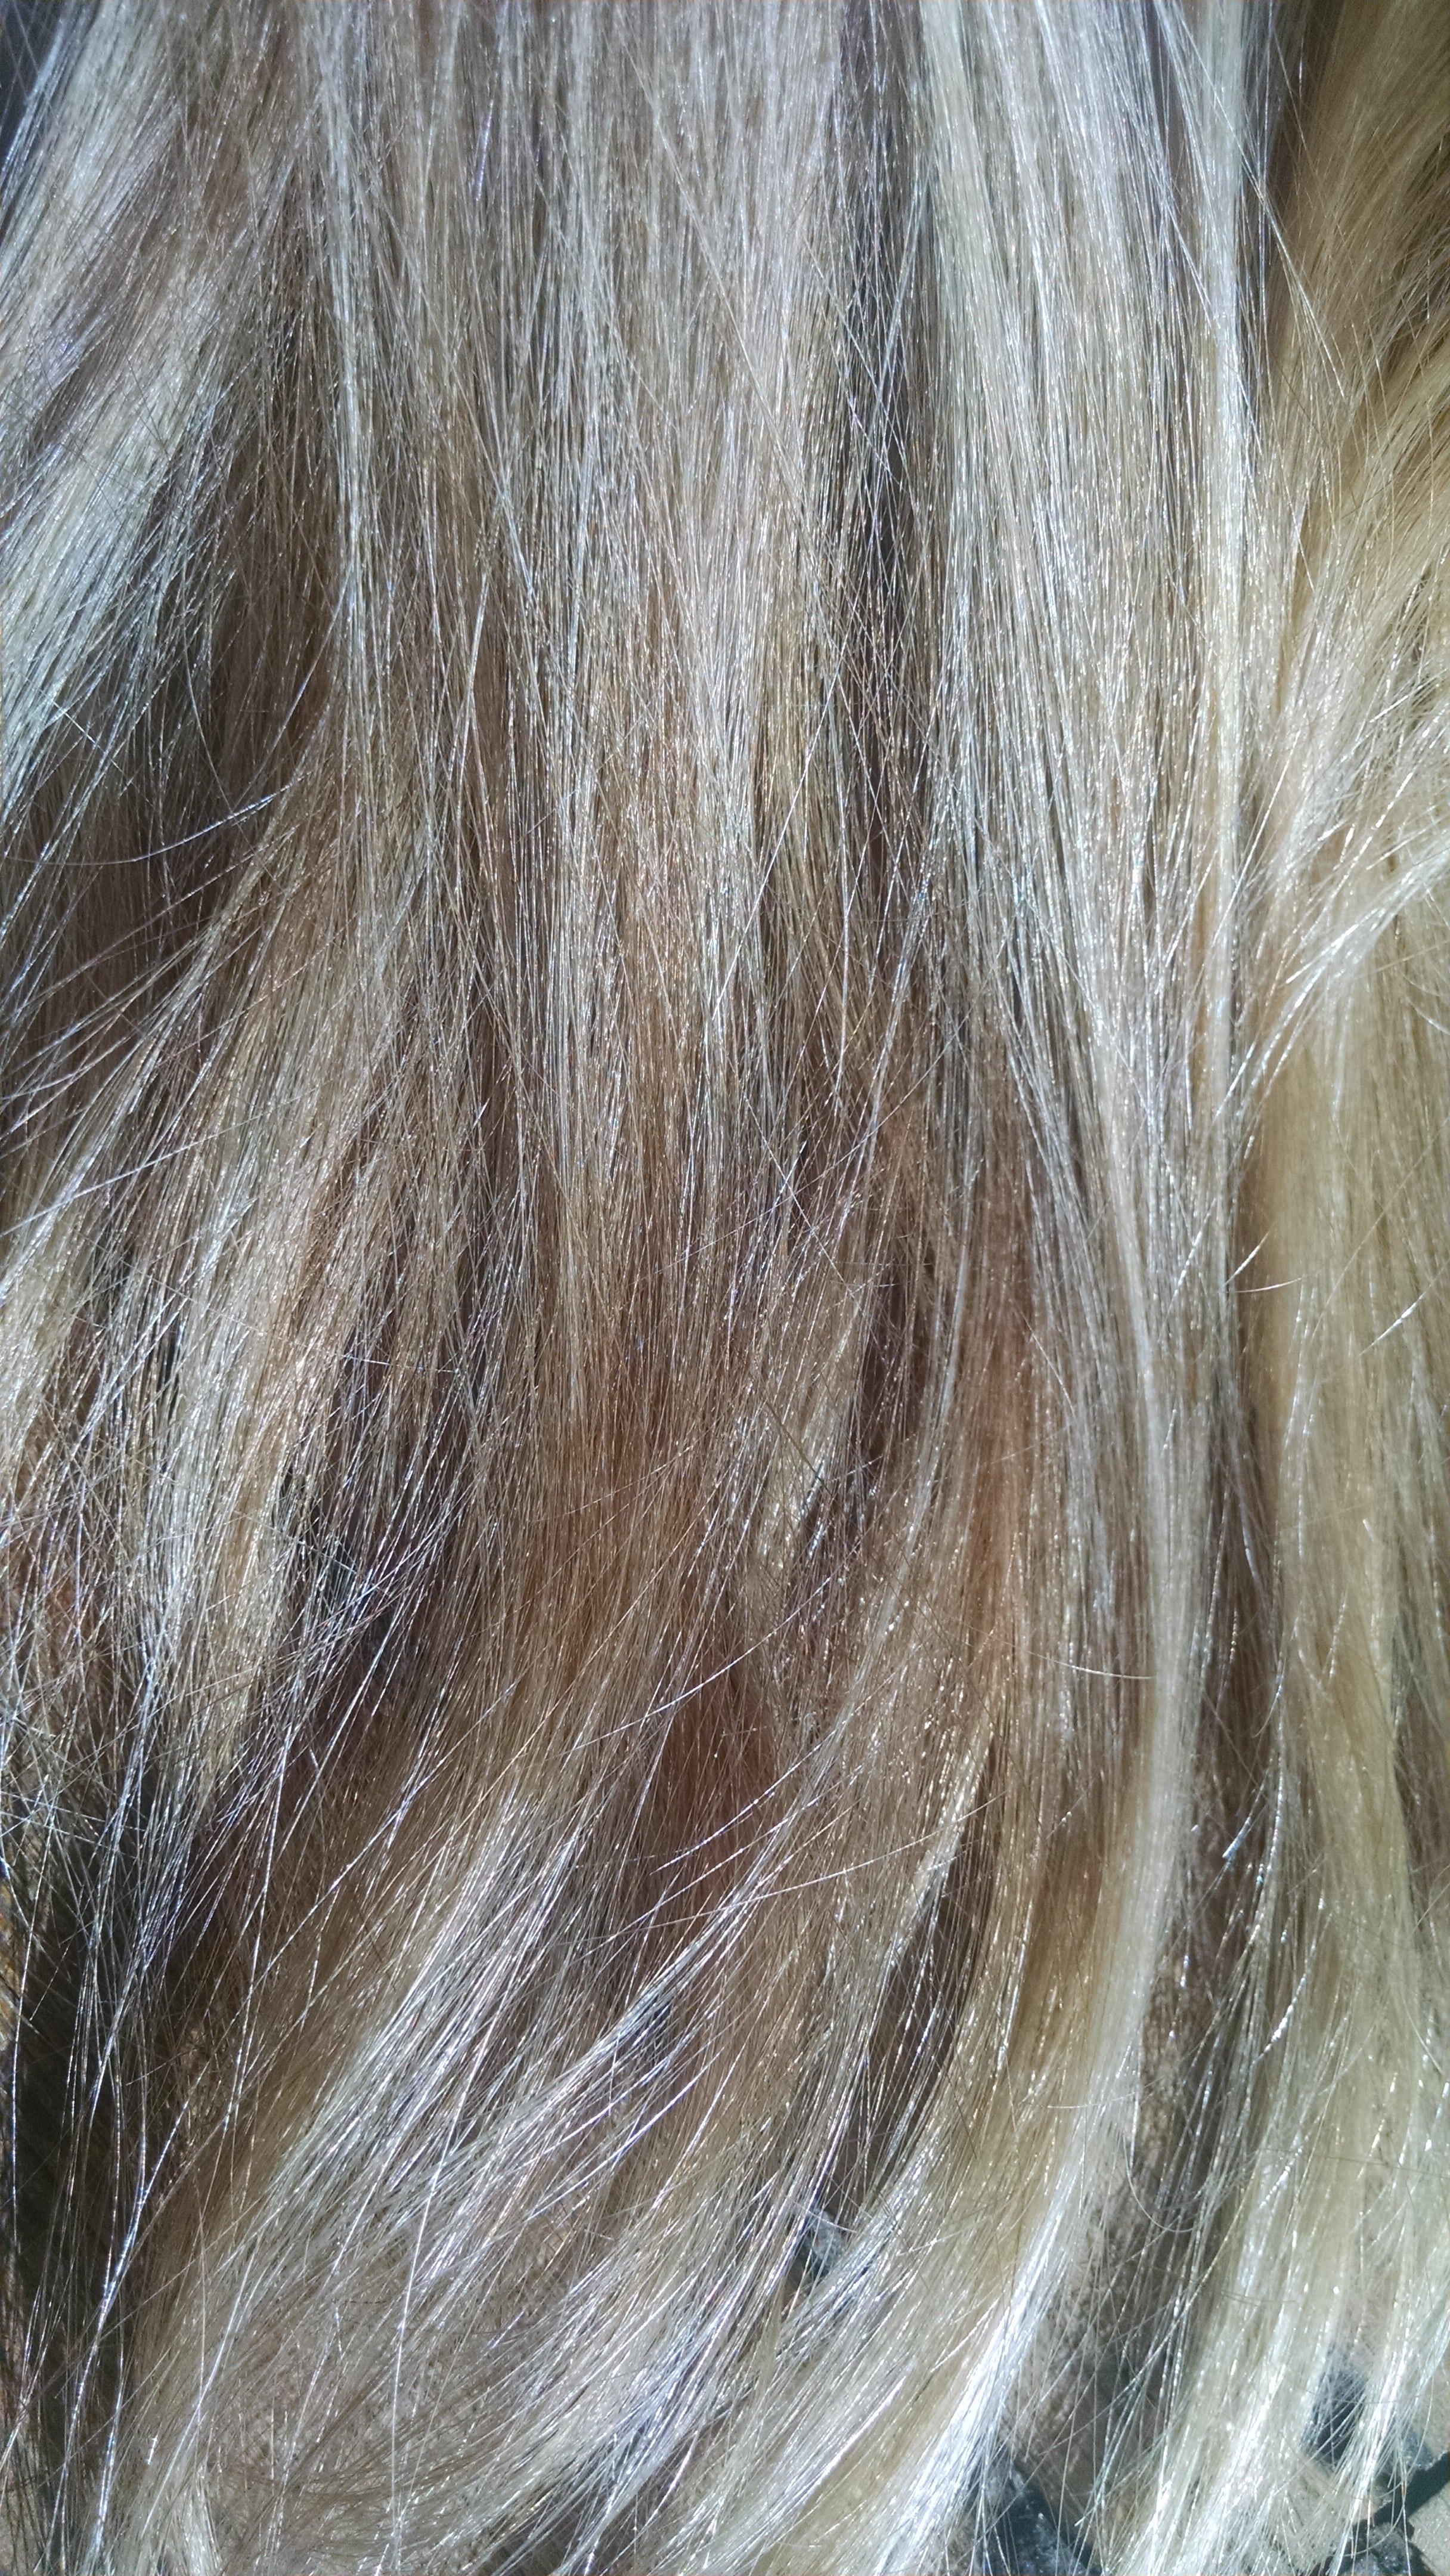 Diy Shiny Hair Masque Cinnamon Yogurt Quickbread